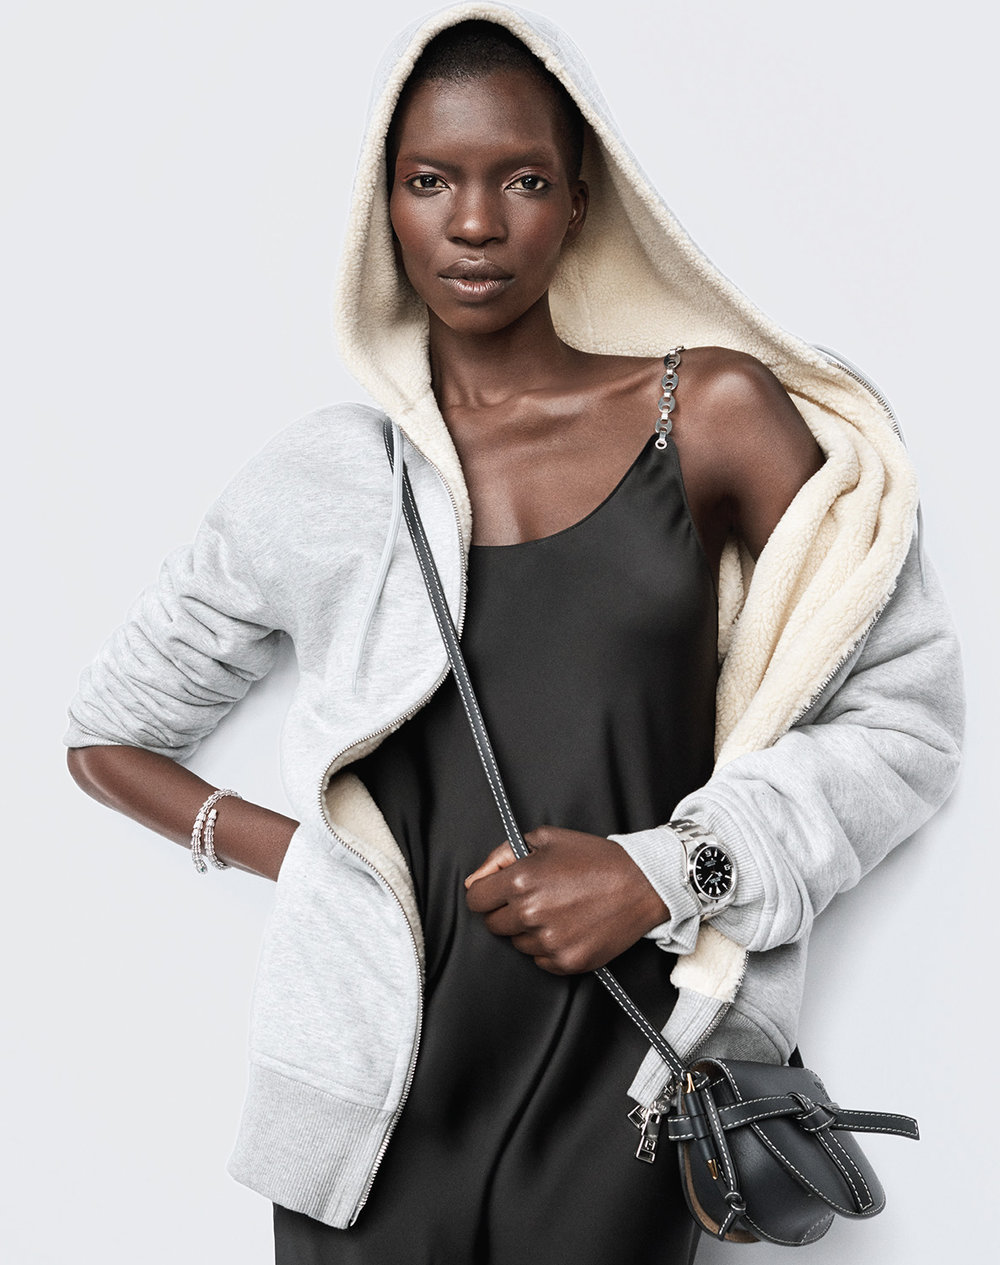 Achok Majak by Tom Schirmacher in 'Carry On' for Elle US Oct 2018 (15).jpg